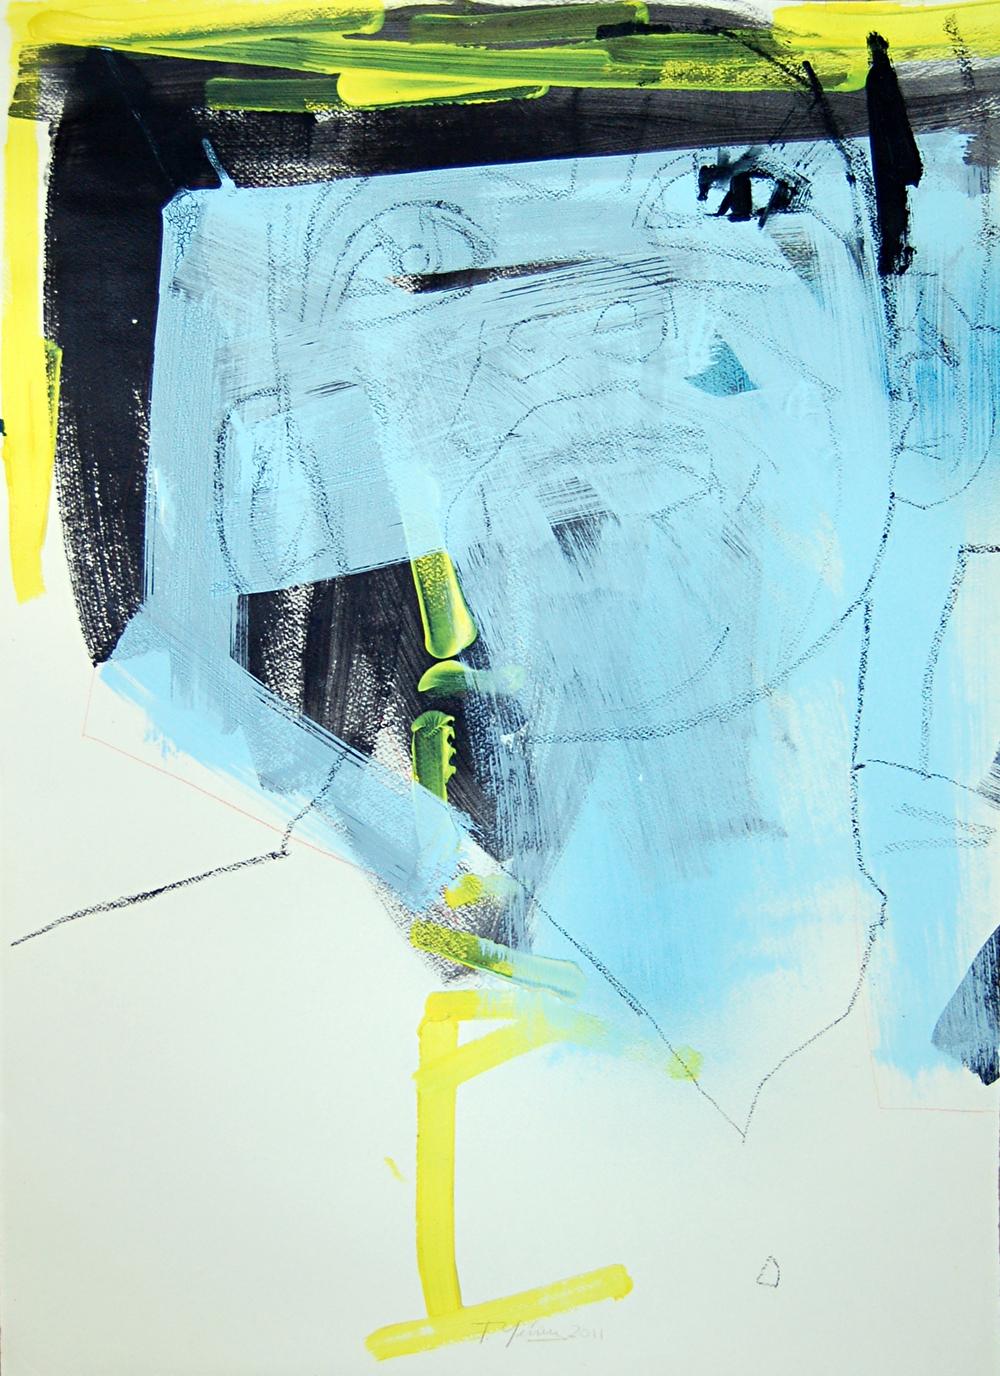 FranciscoNunez,Joselier (Versioń), Mixed media on paper, 52cm x 75cm